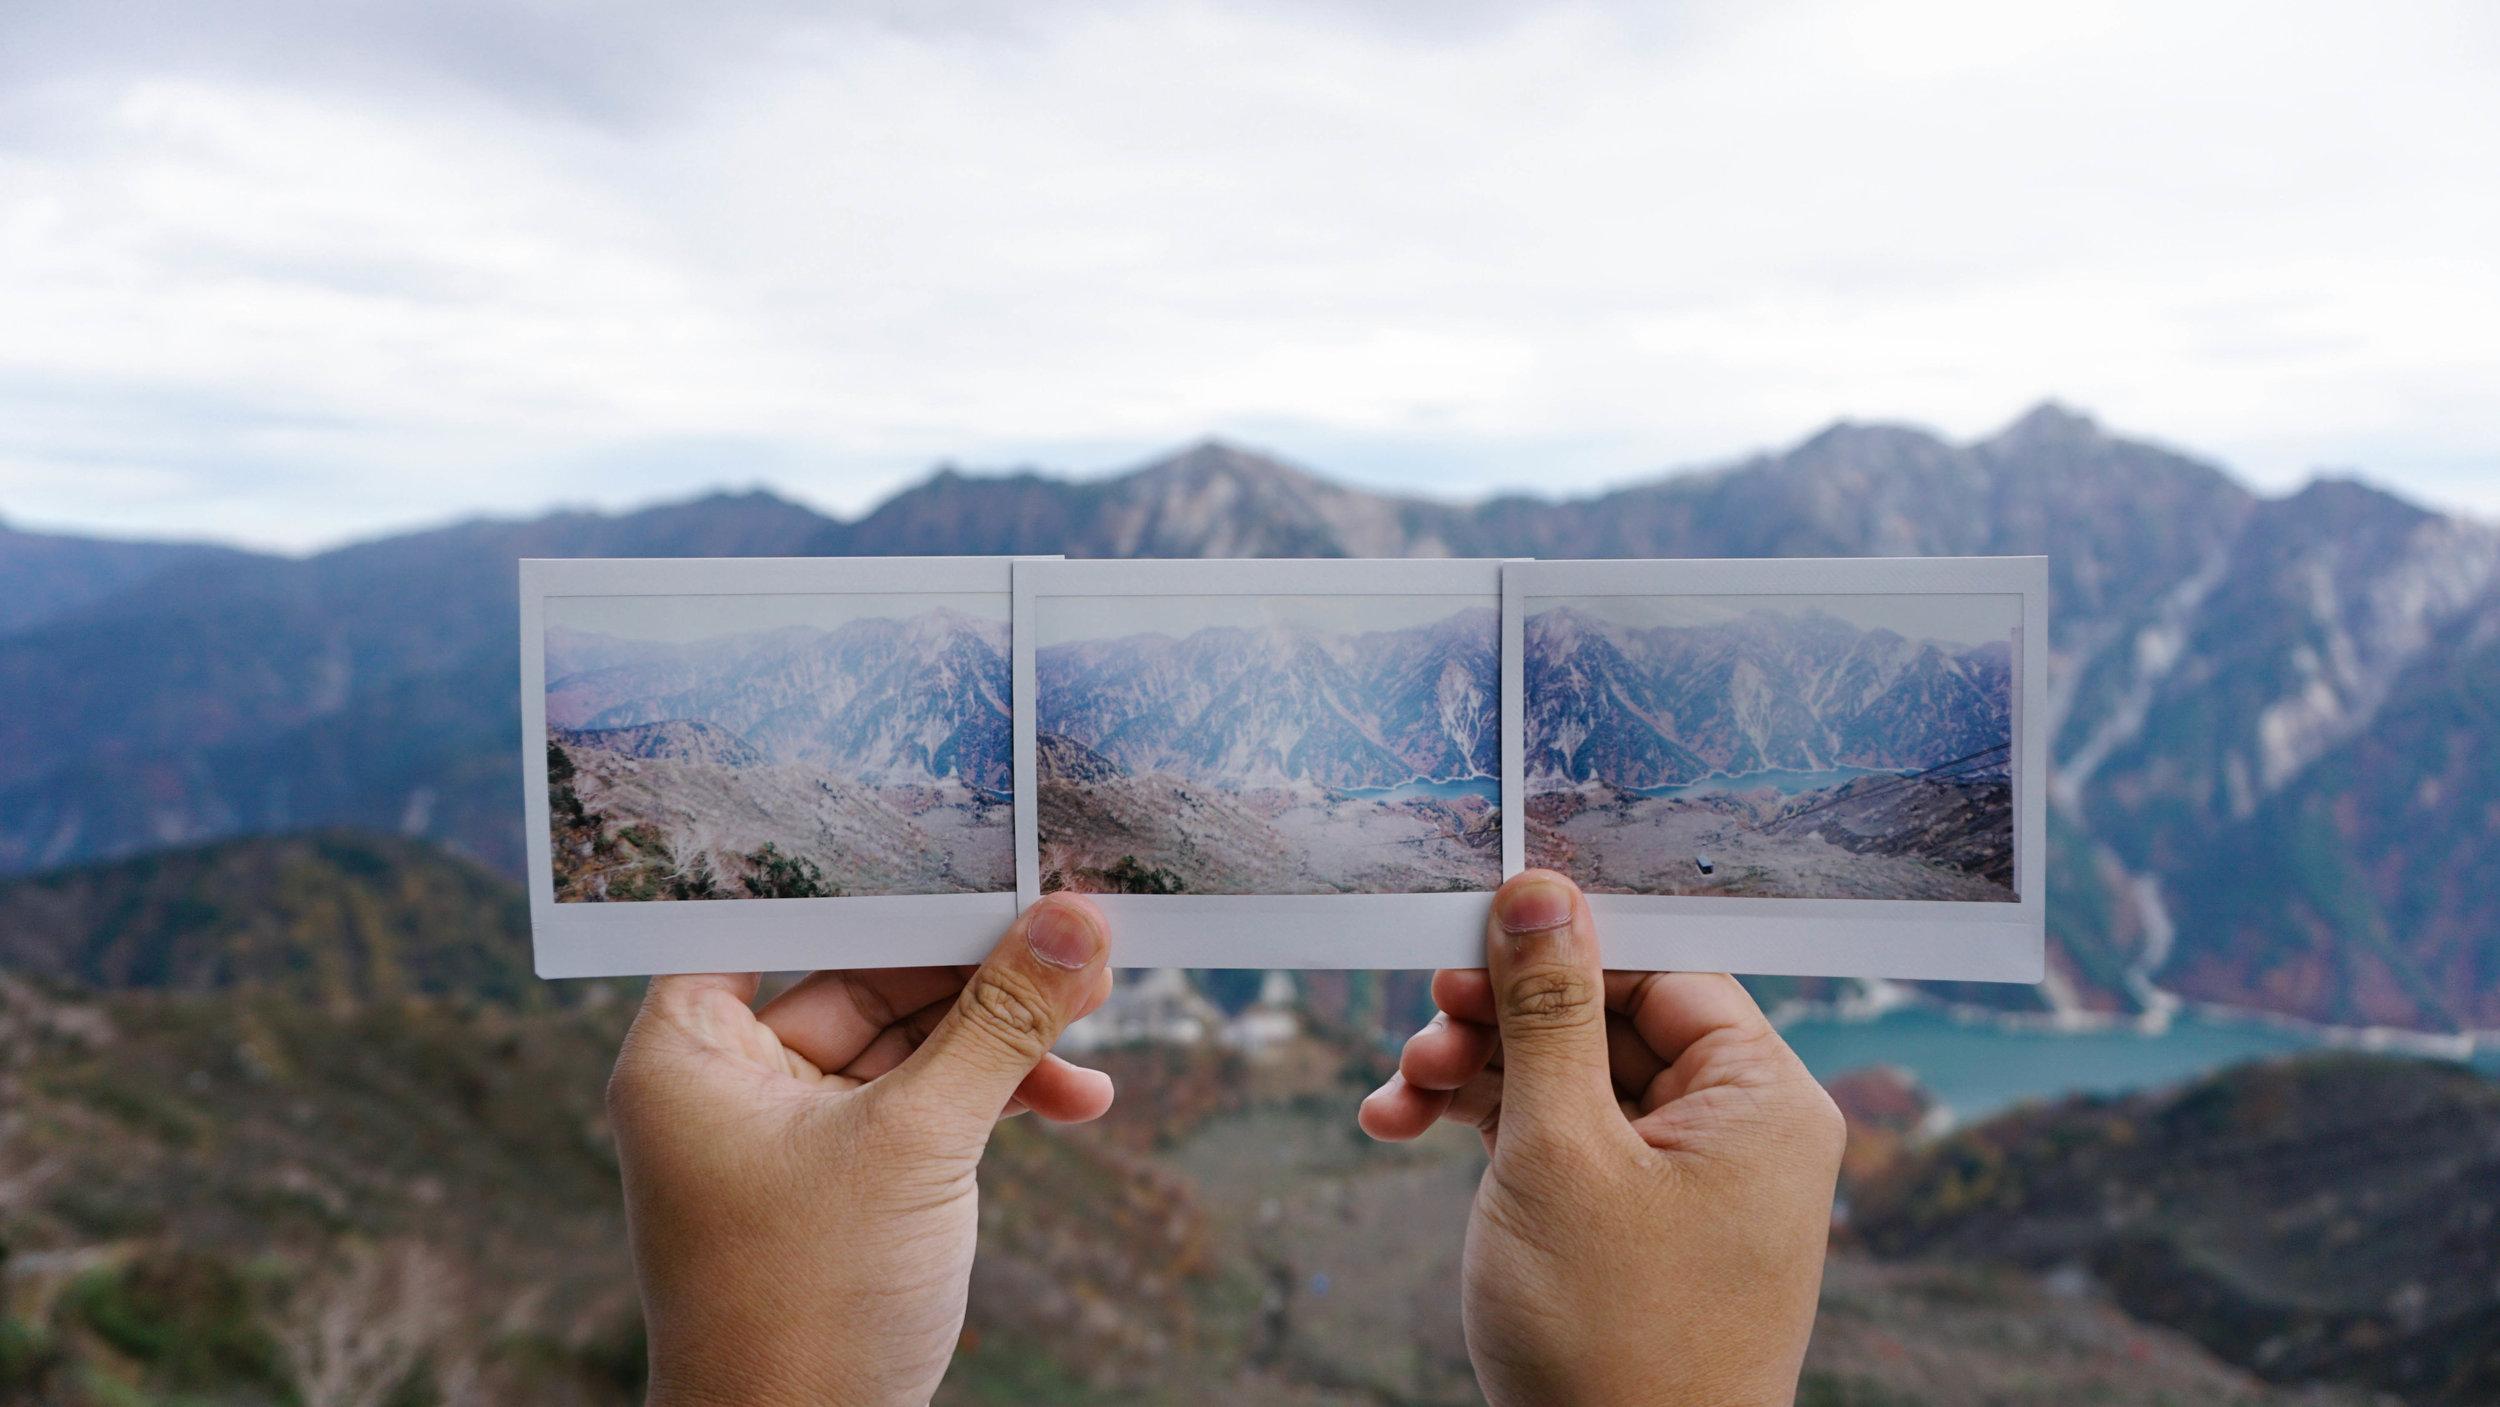 Panorama, Polaroid style!